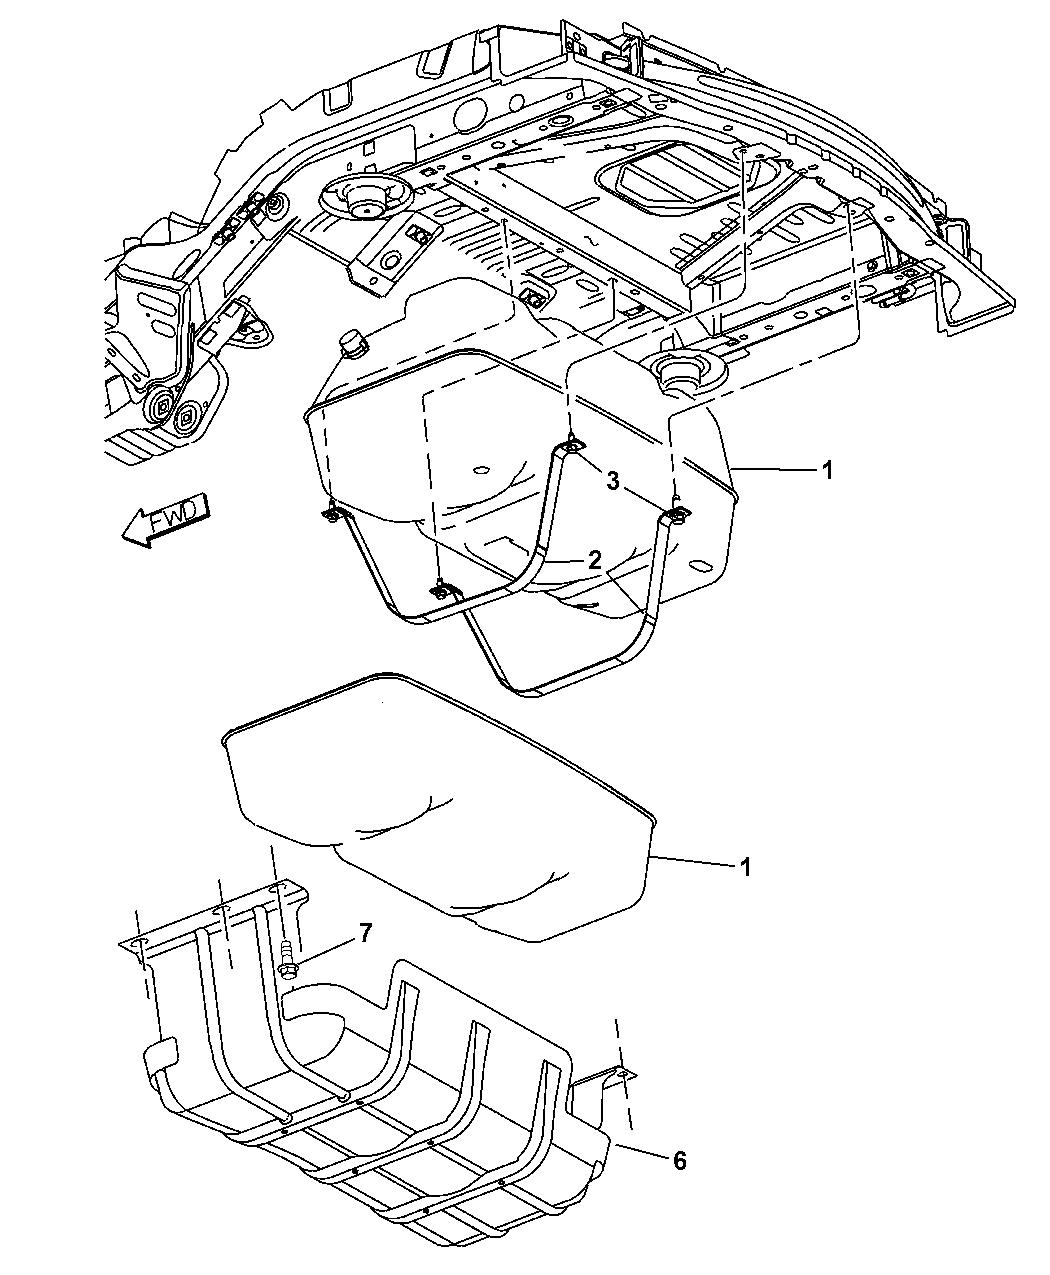 2003 Jeep Liberty Fuel Tank